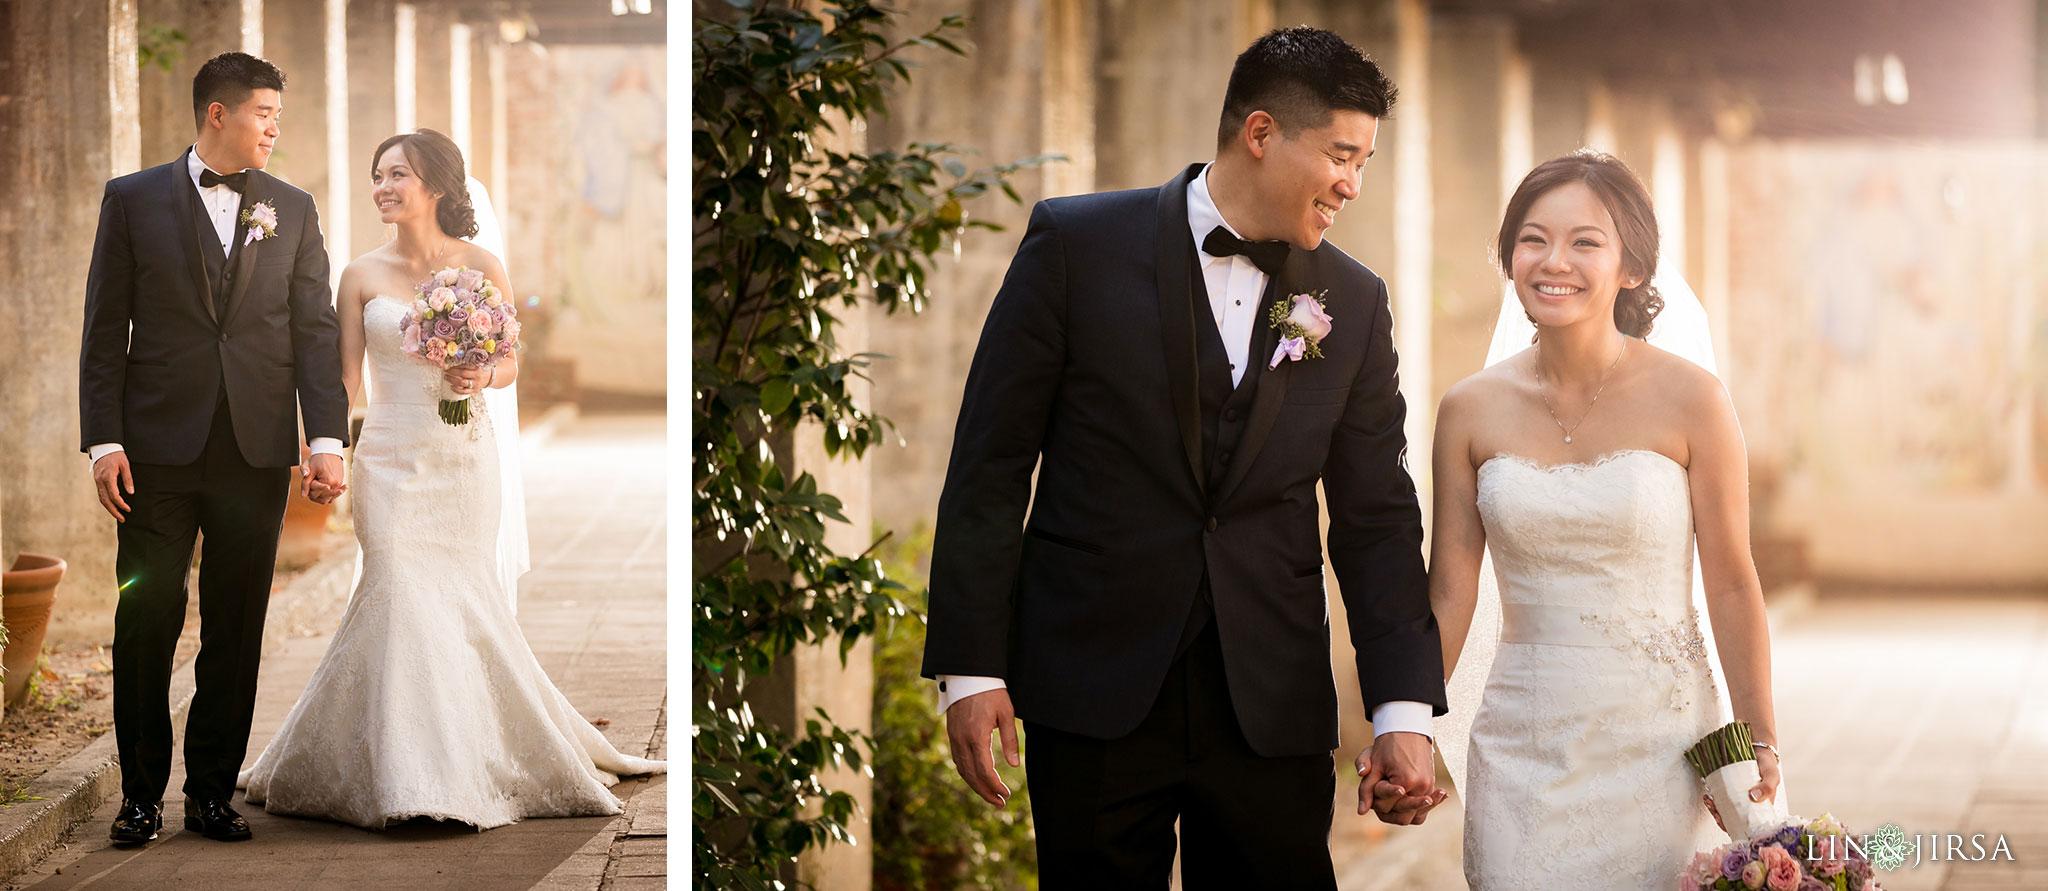 13 orange county wedding photography